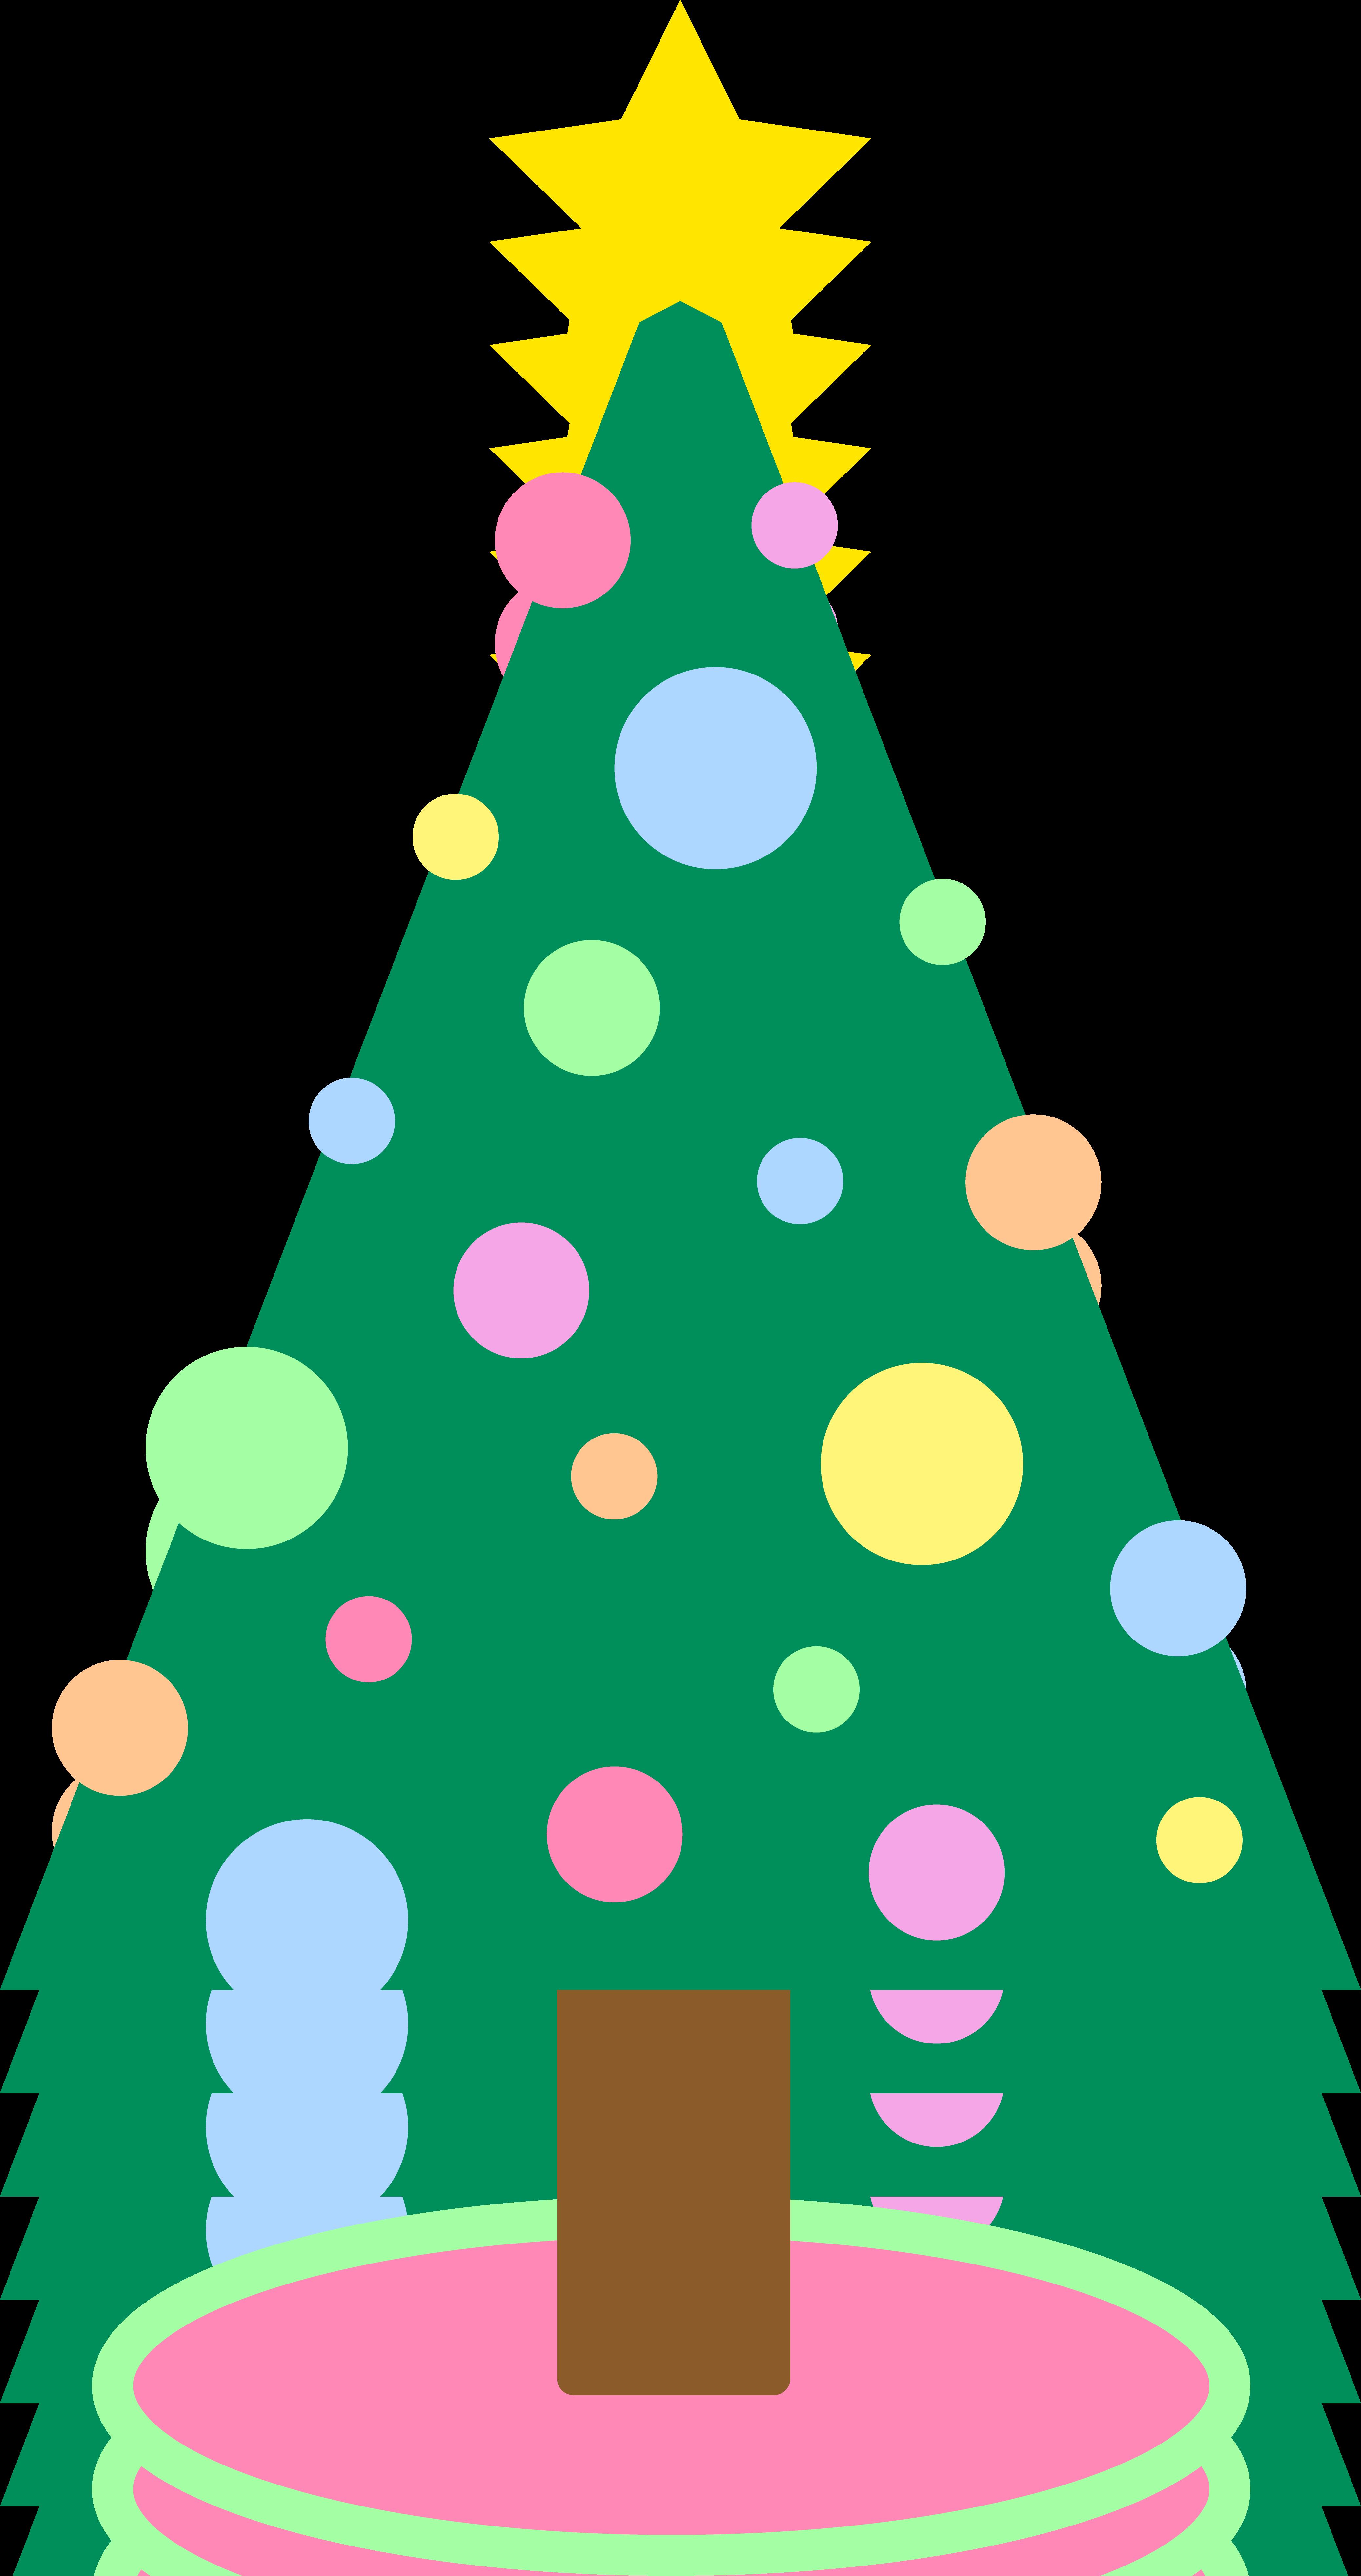 4150x7856 Christmas Ornaments Clipart Cute